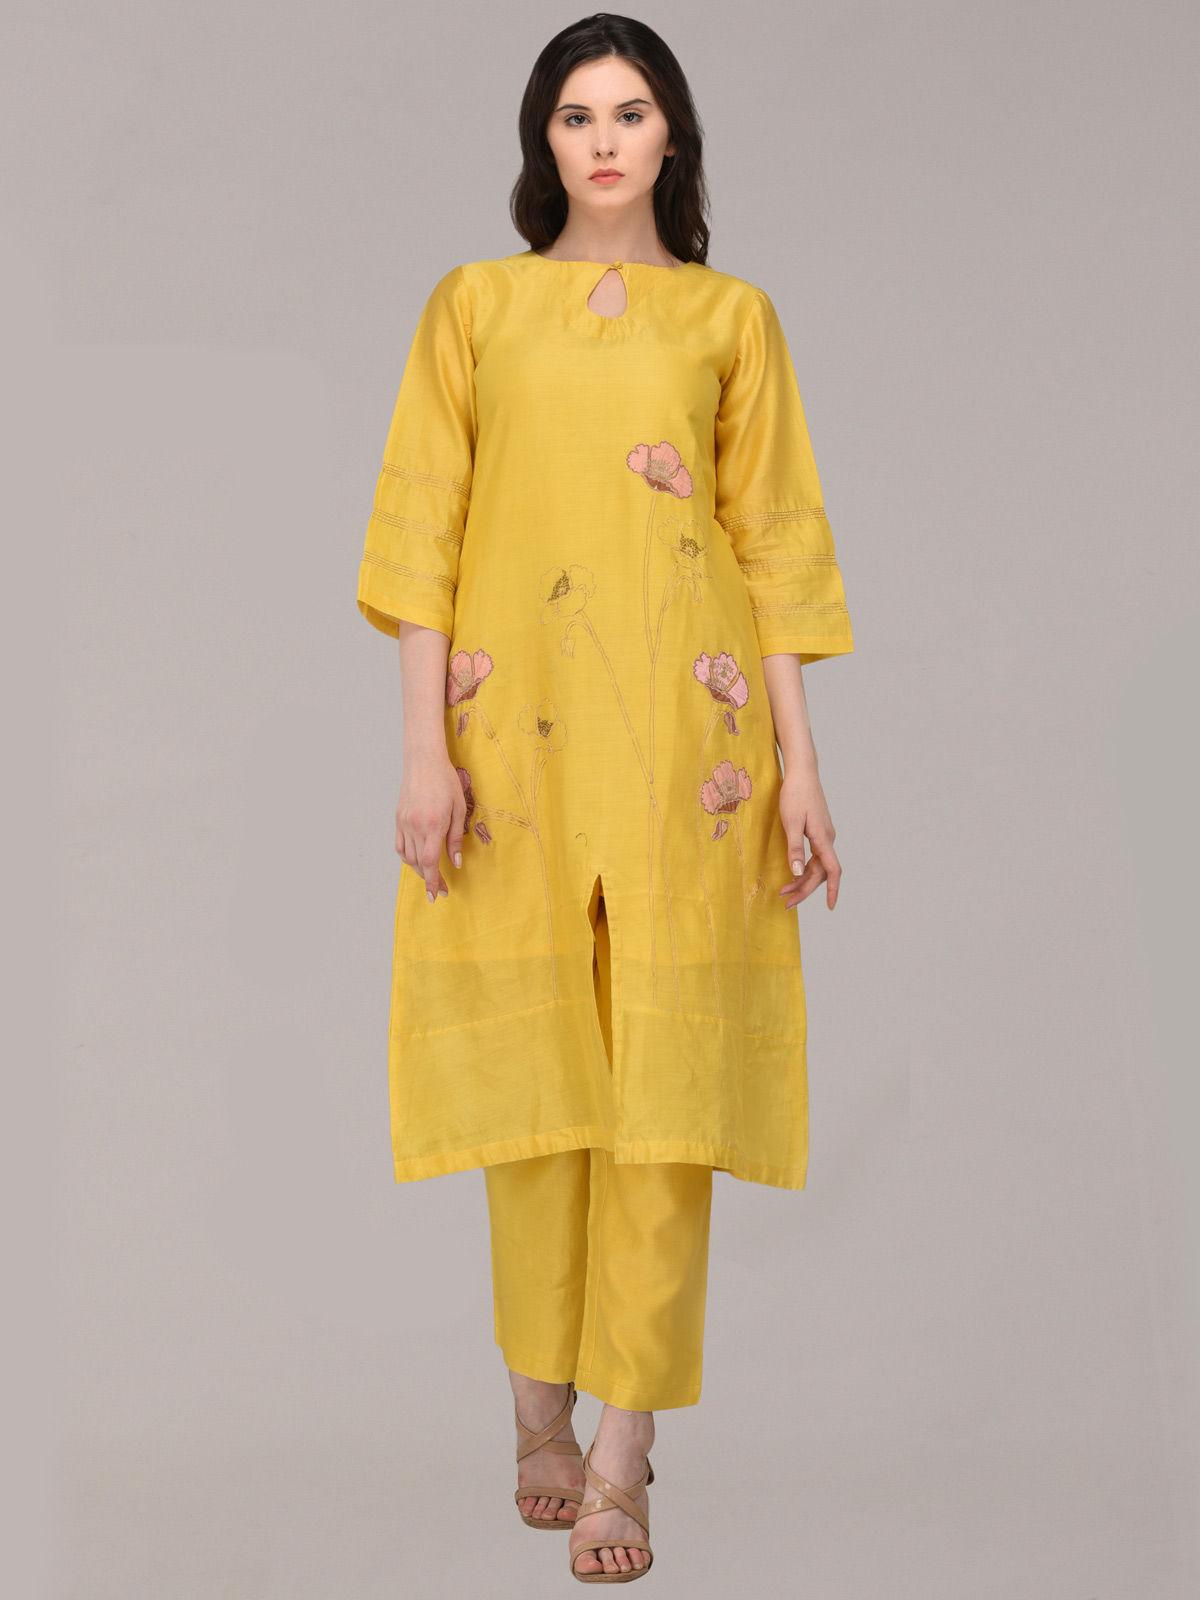 Kalika applique embroided mustard Chanderi kurta &  bottom set